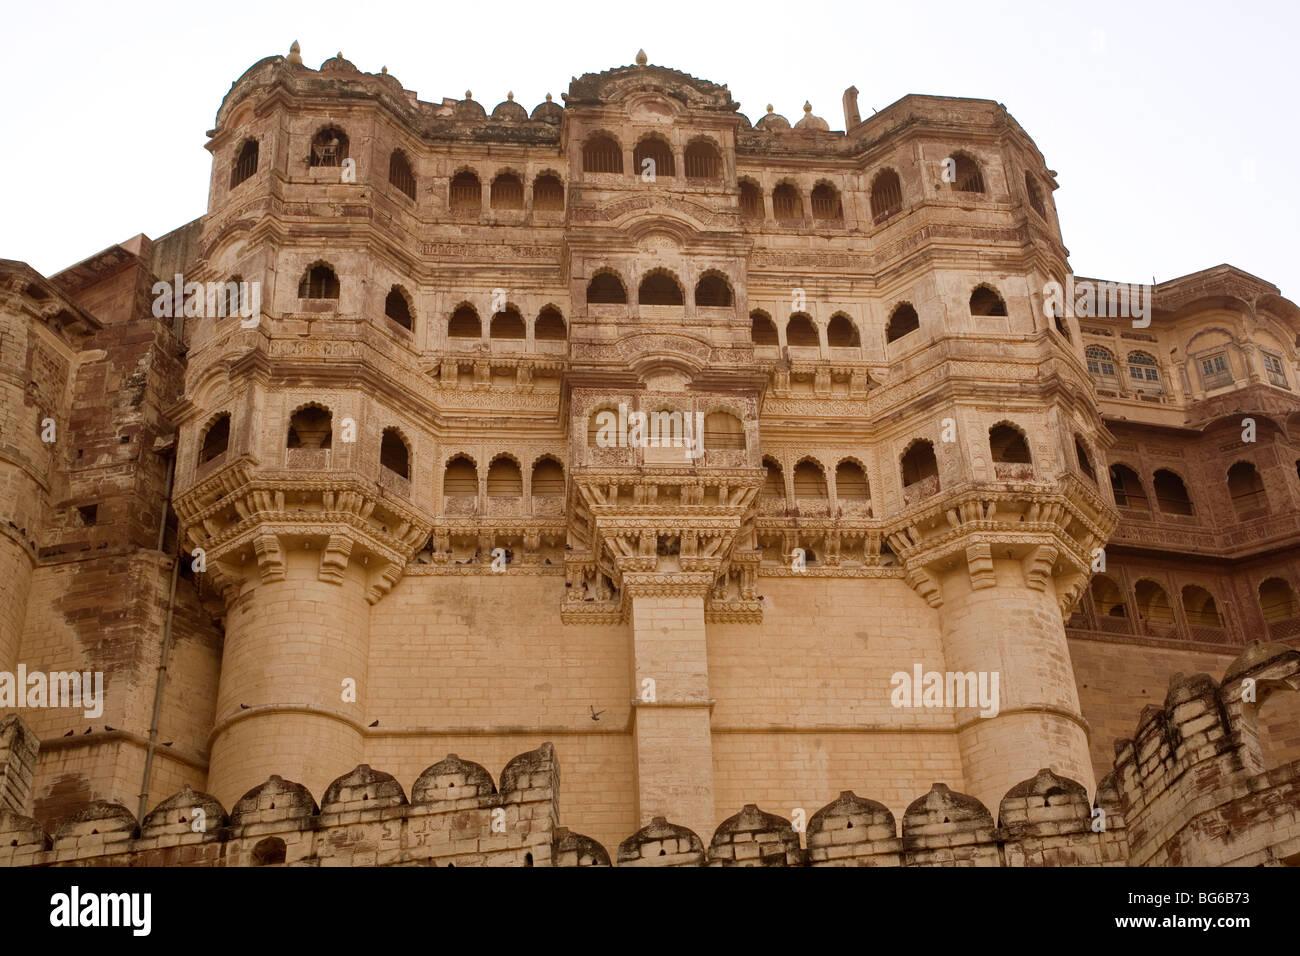 India Rajasthan Jodhpur Meherangarh fort - Stock Image